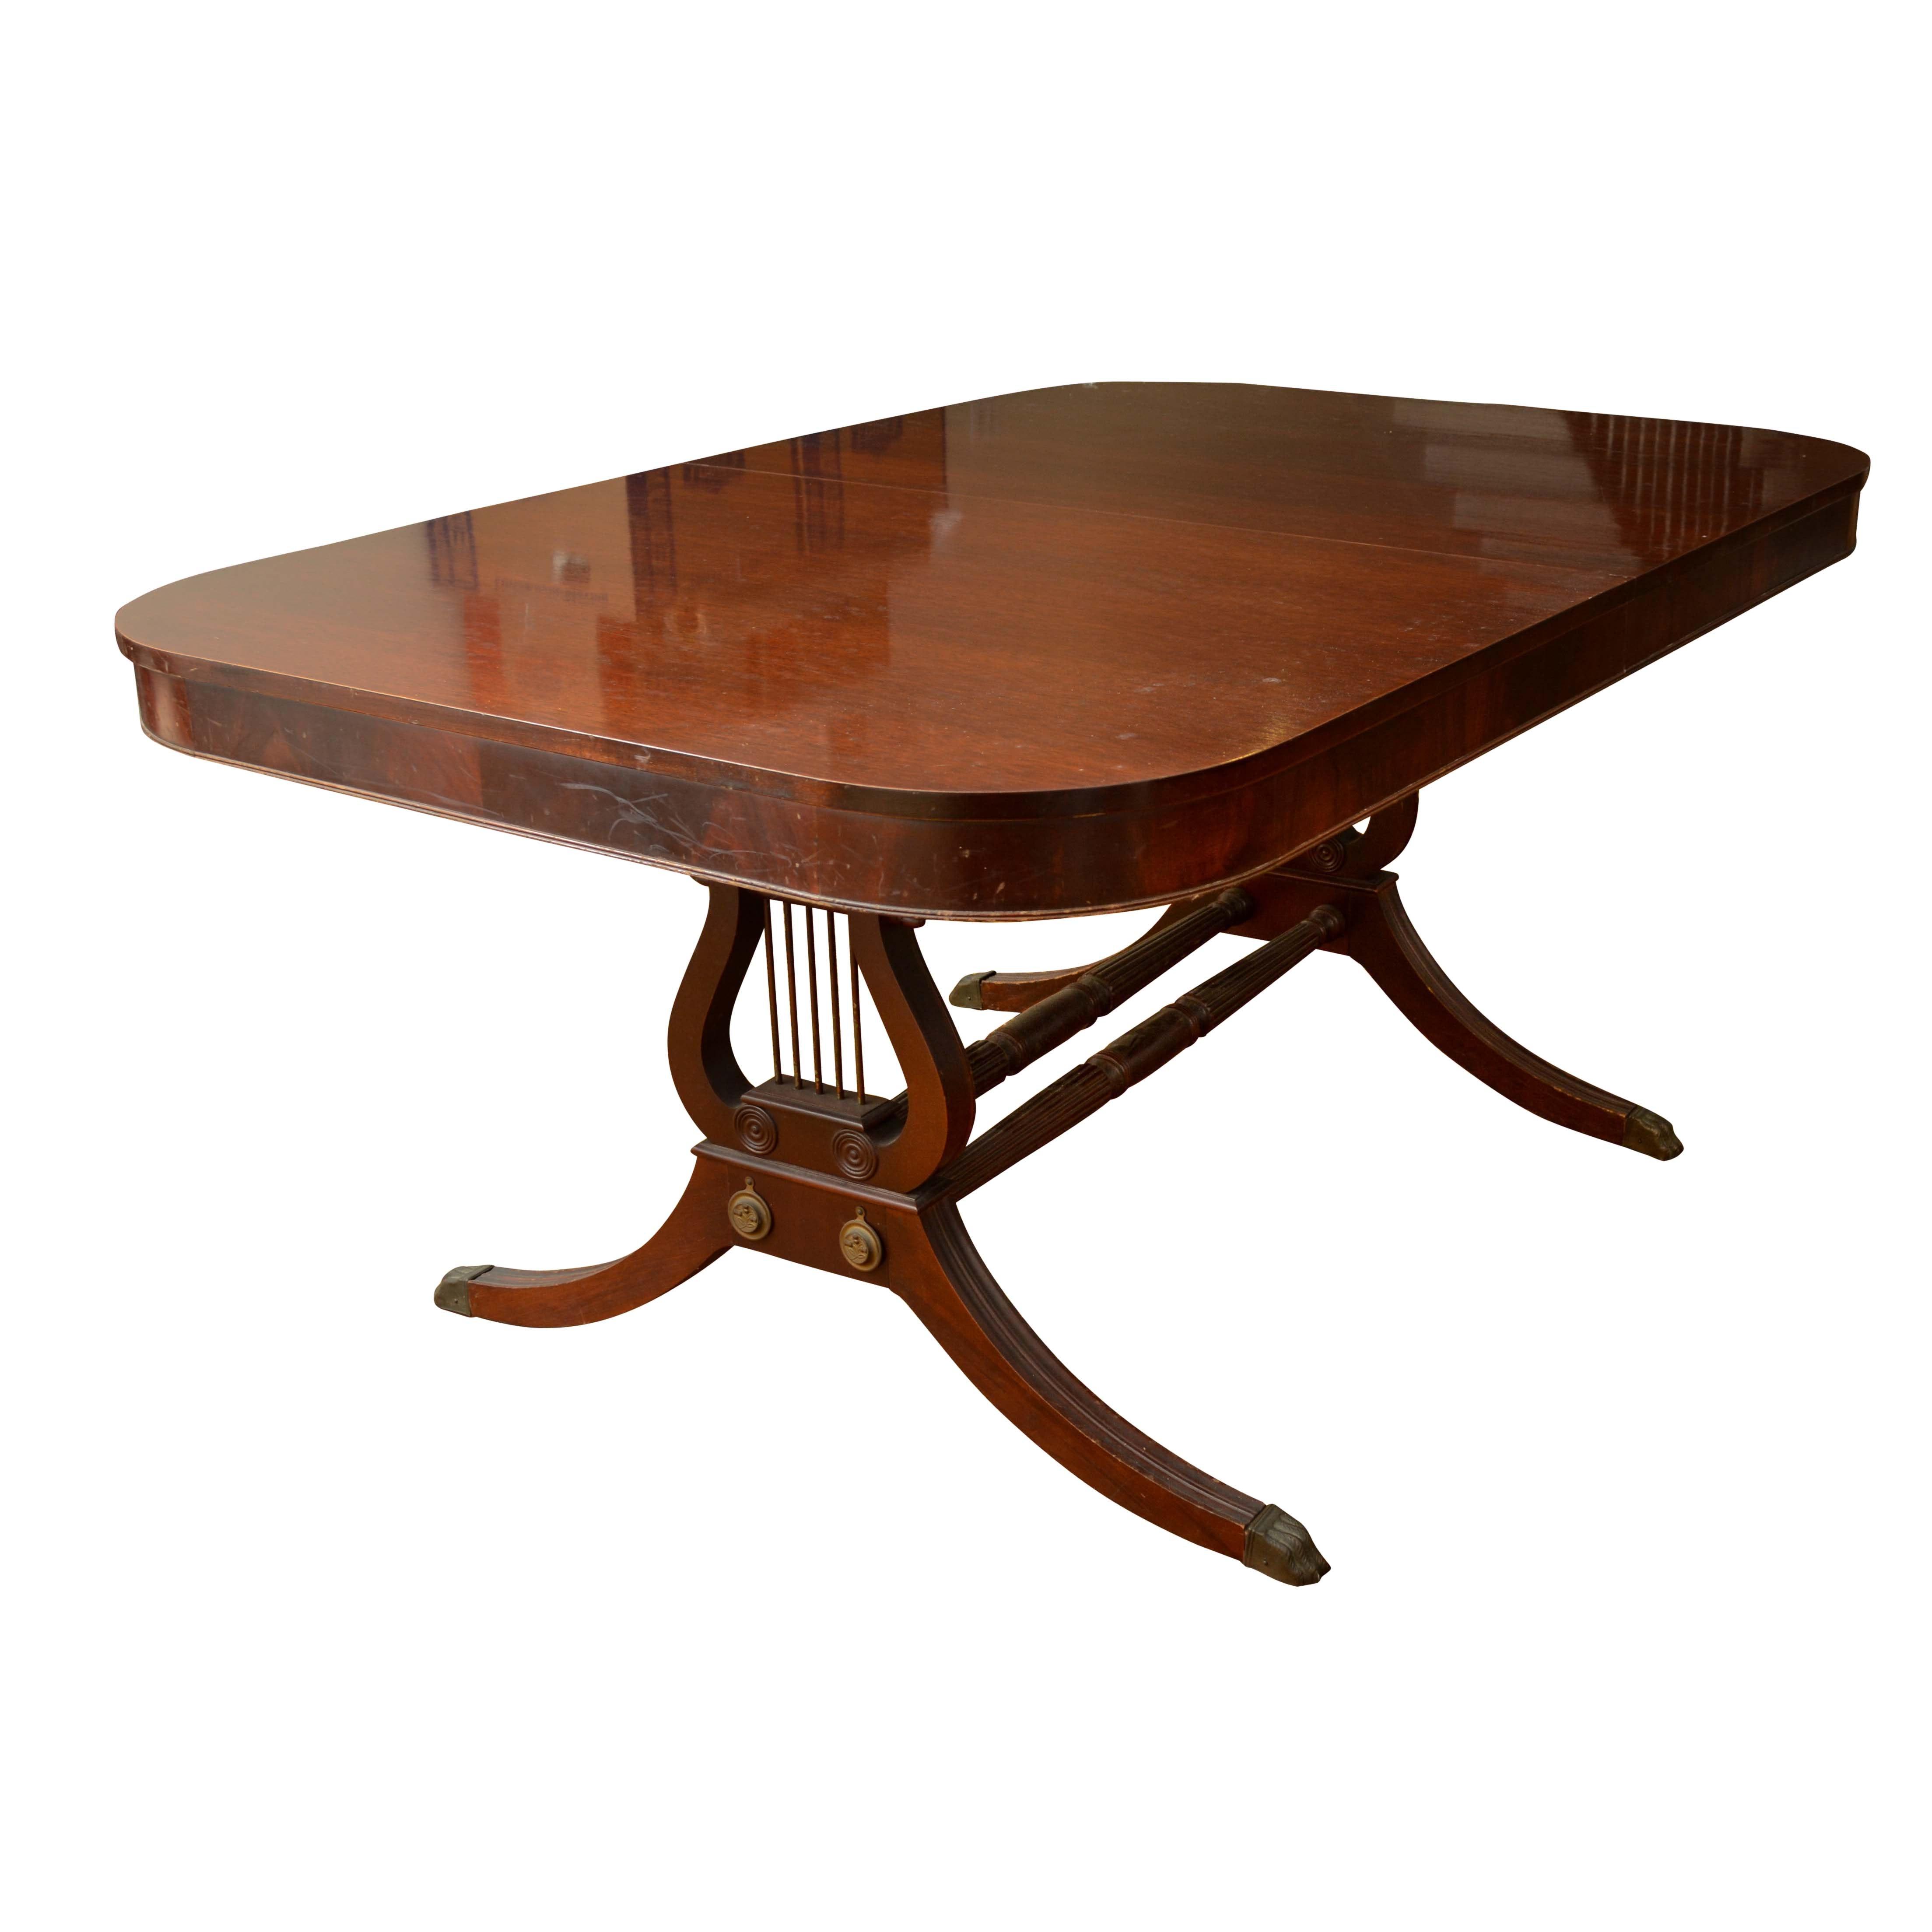 Vintage Regency Style Mahogany Lyre Base Dining Table